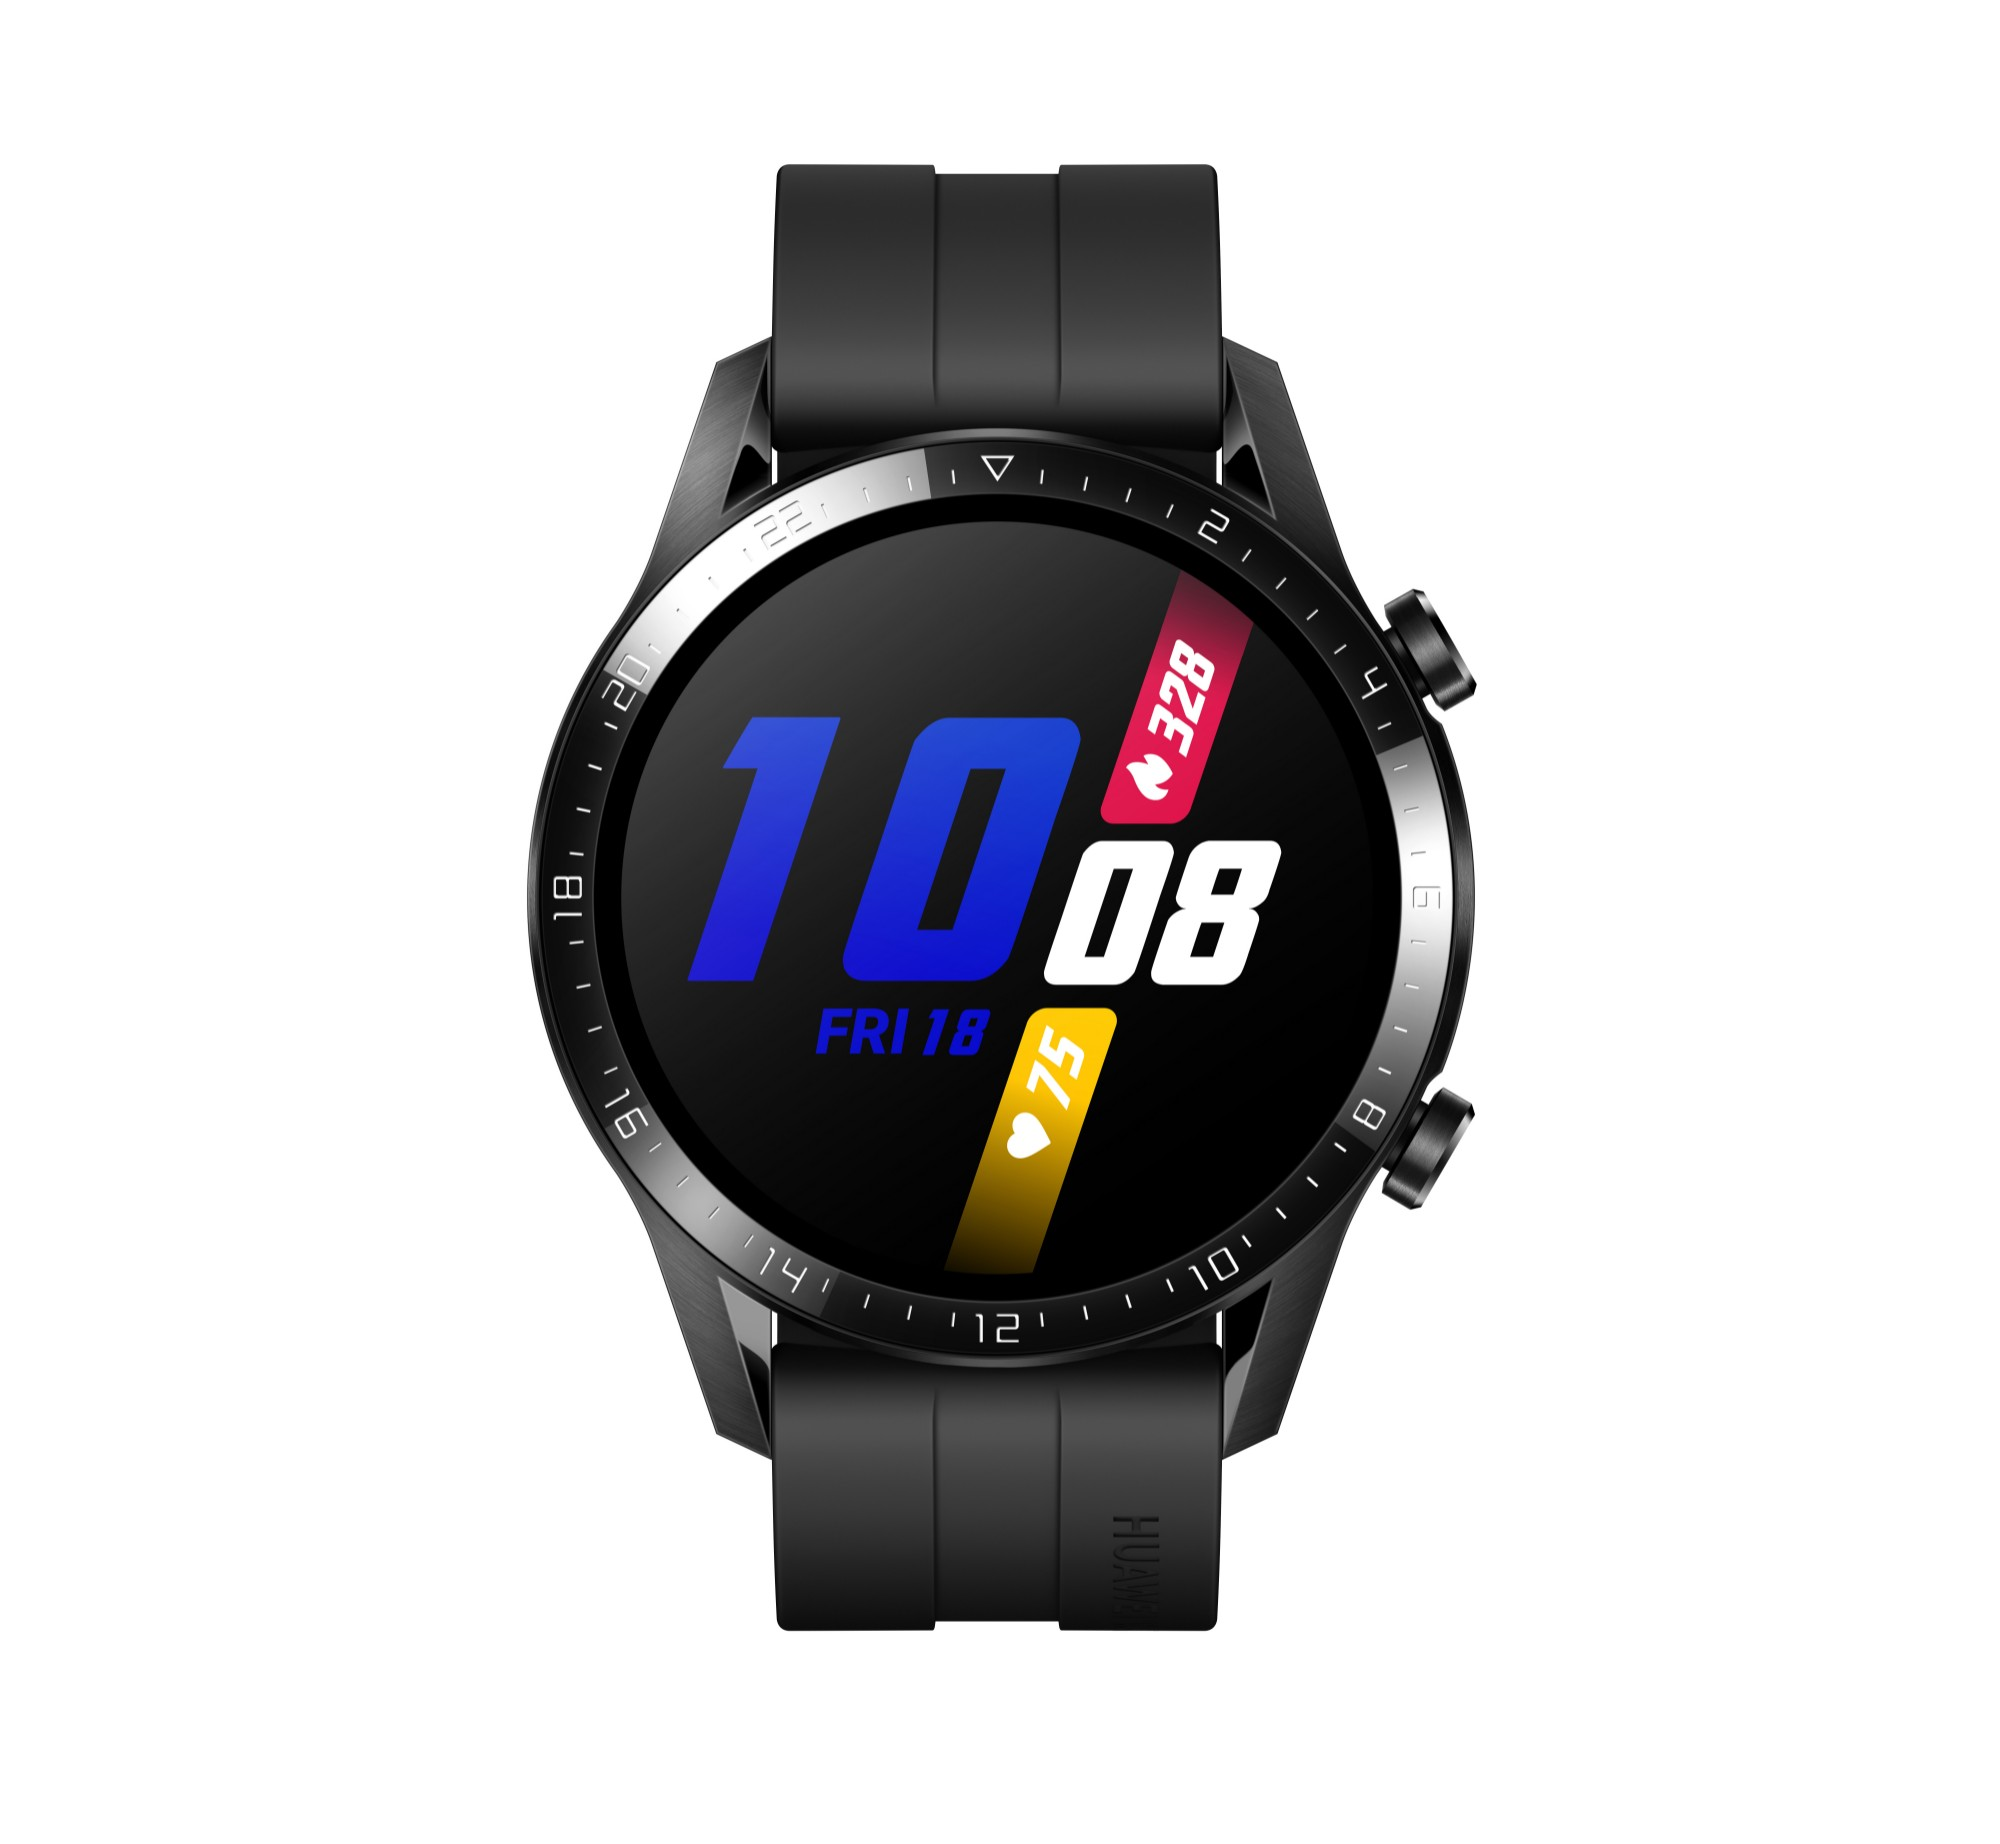 Huawei WATCH GT 2 smartwatch Black AMOLED 3.53 cm 1.39